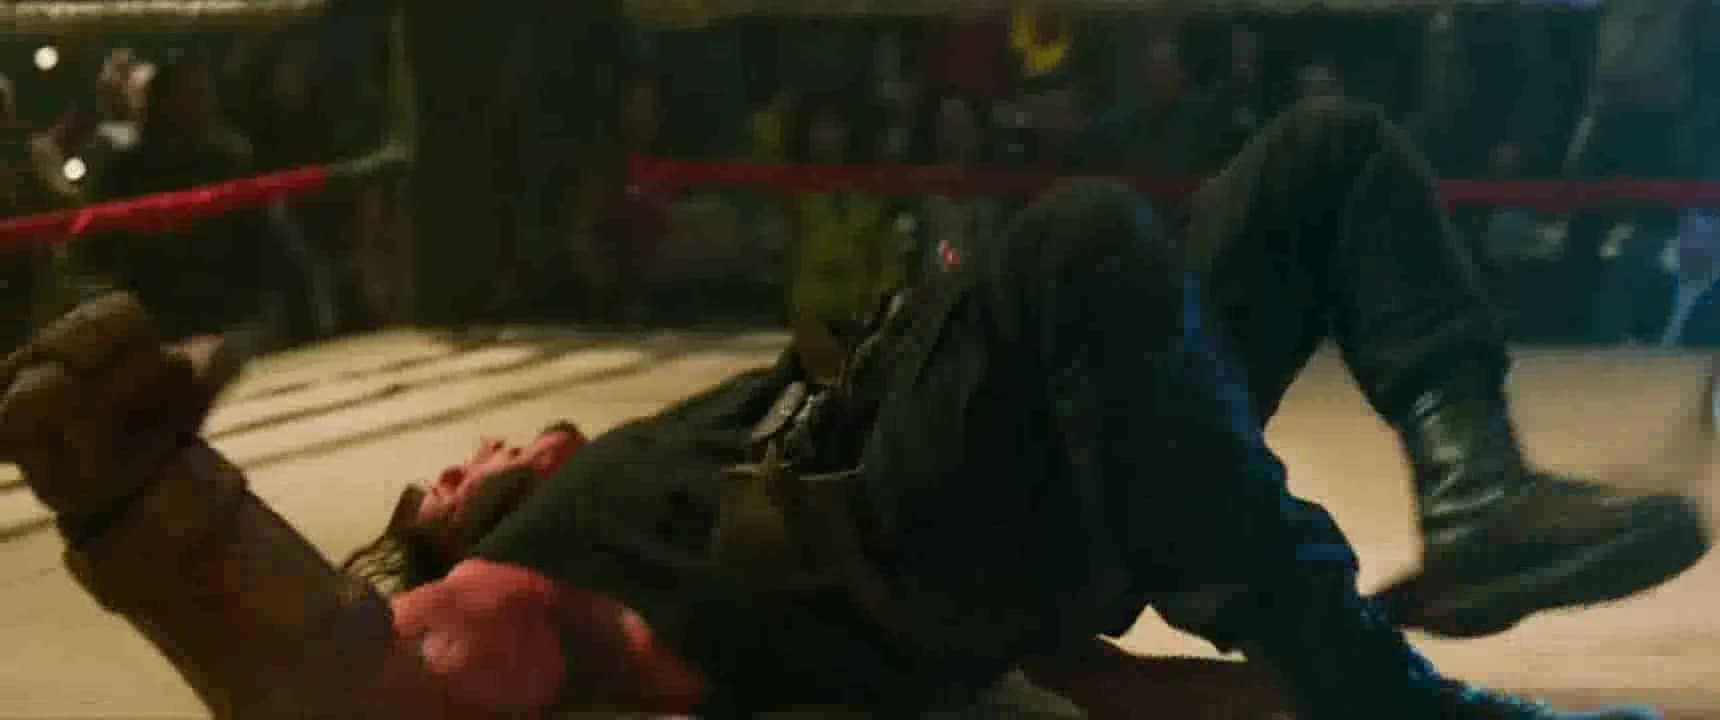 Hellboy  2019  cz dabing